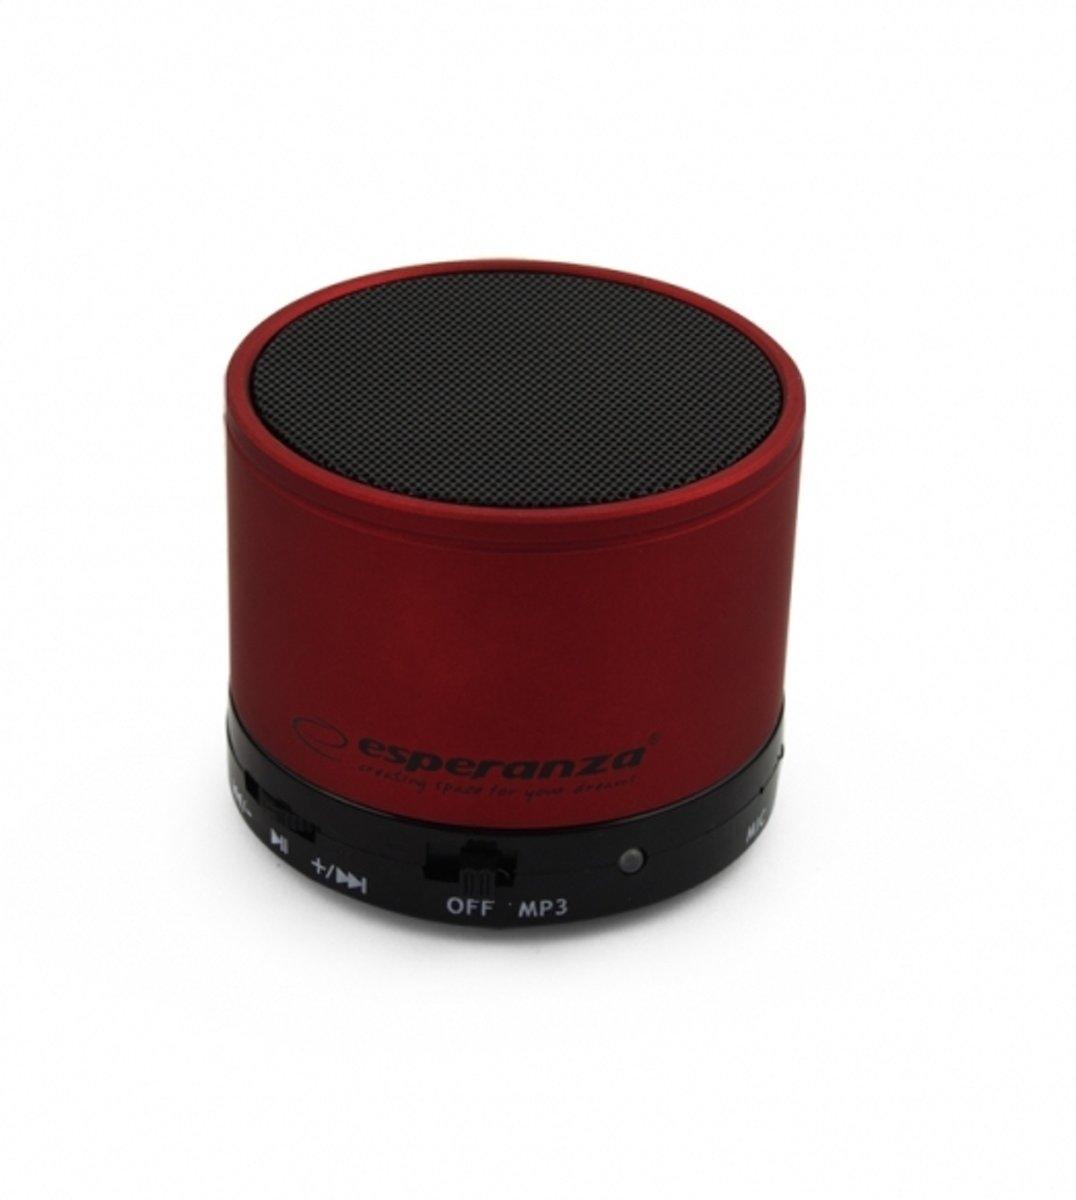 Esperanza Bluetooth Speaker Ritmo - Rood kopen